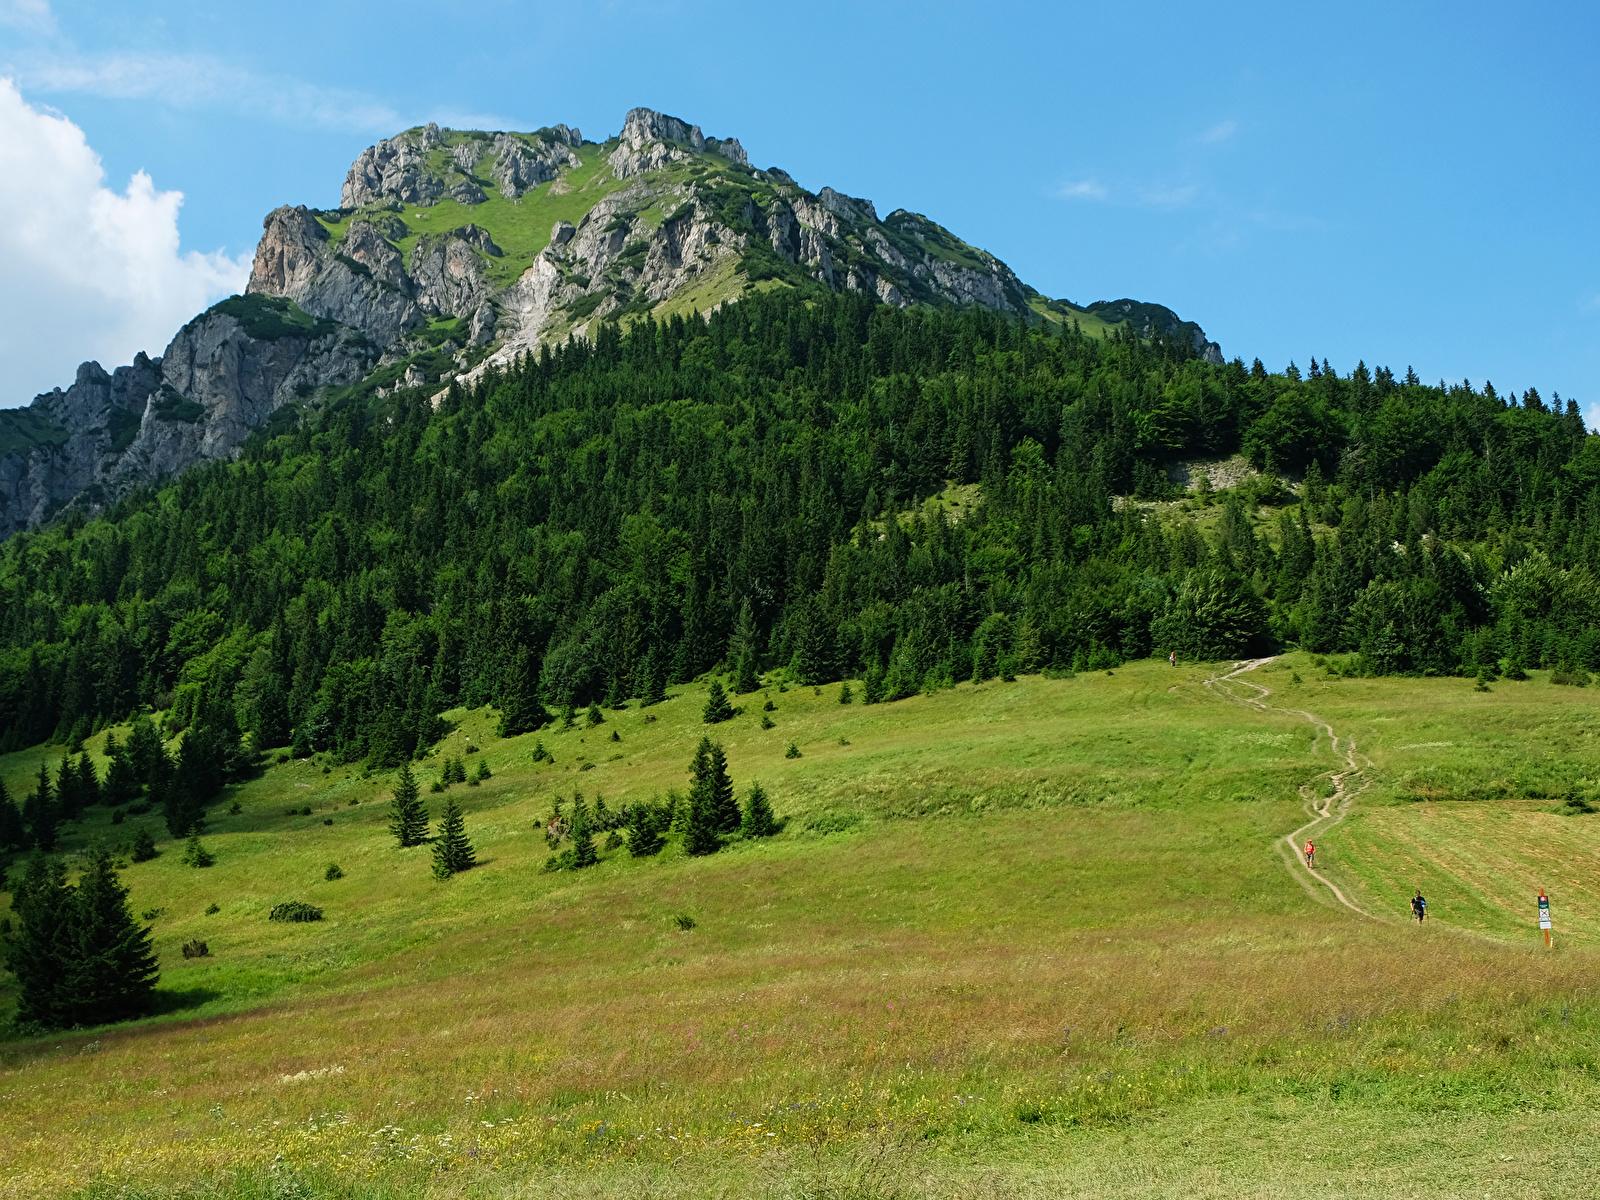 Фото Словакия Tatras гора Природа Луга Леса 1600x1200 Горы лес